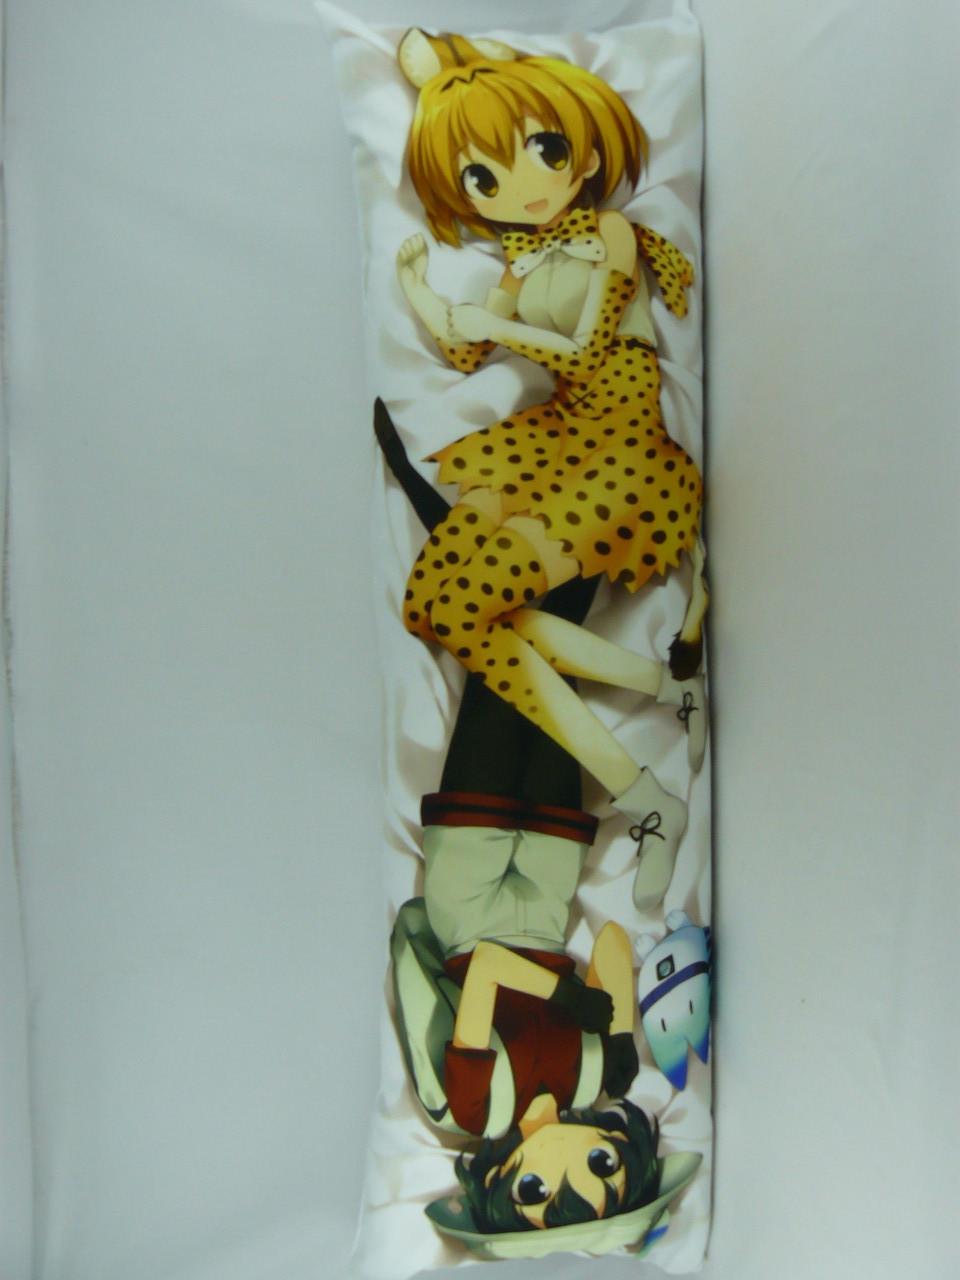 Подушка обнимашка Дакимакура 150 х 50 Кемоно для обнимания аниме со съёмной наволочкой односторонняя